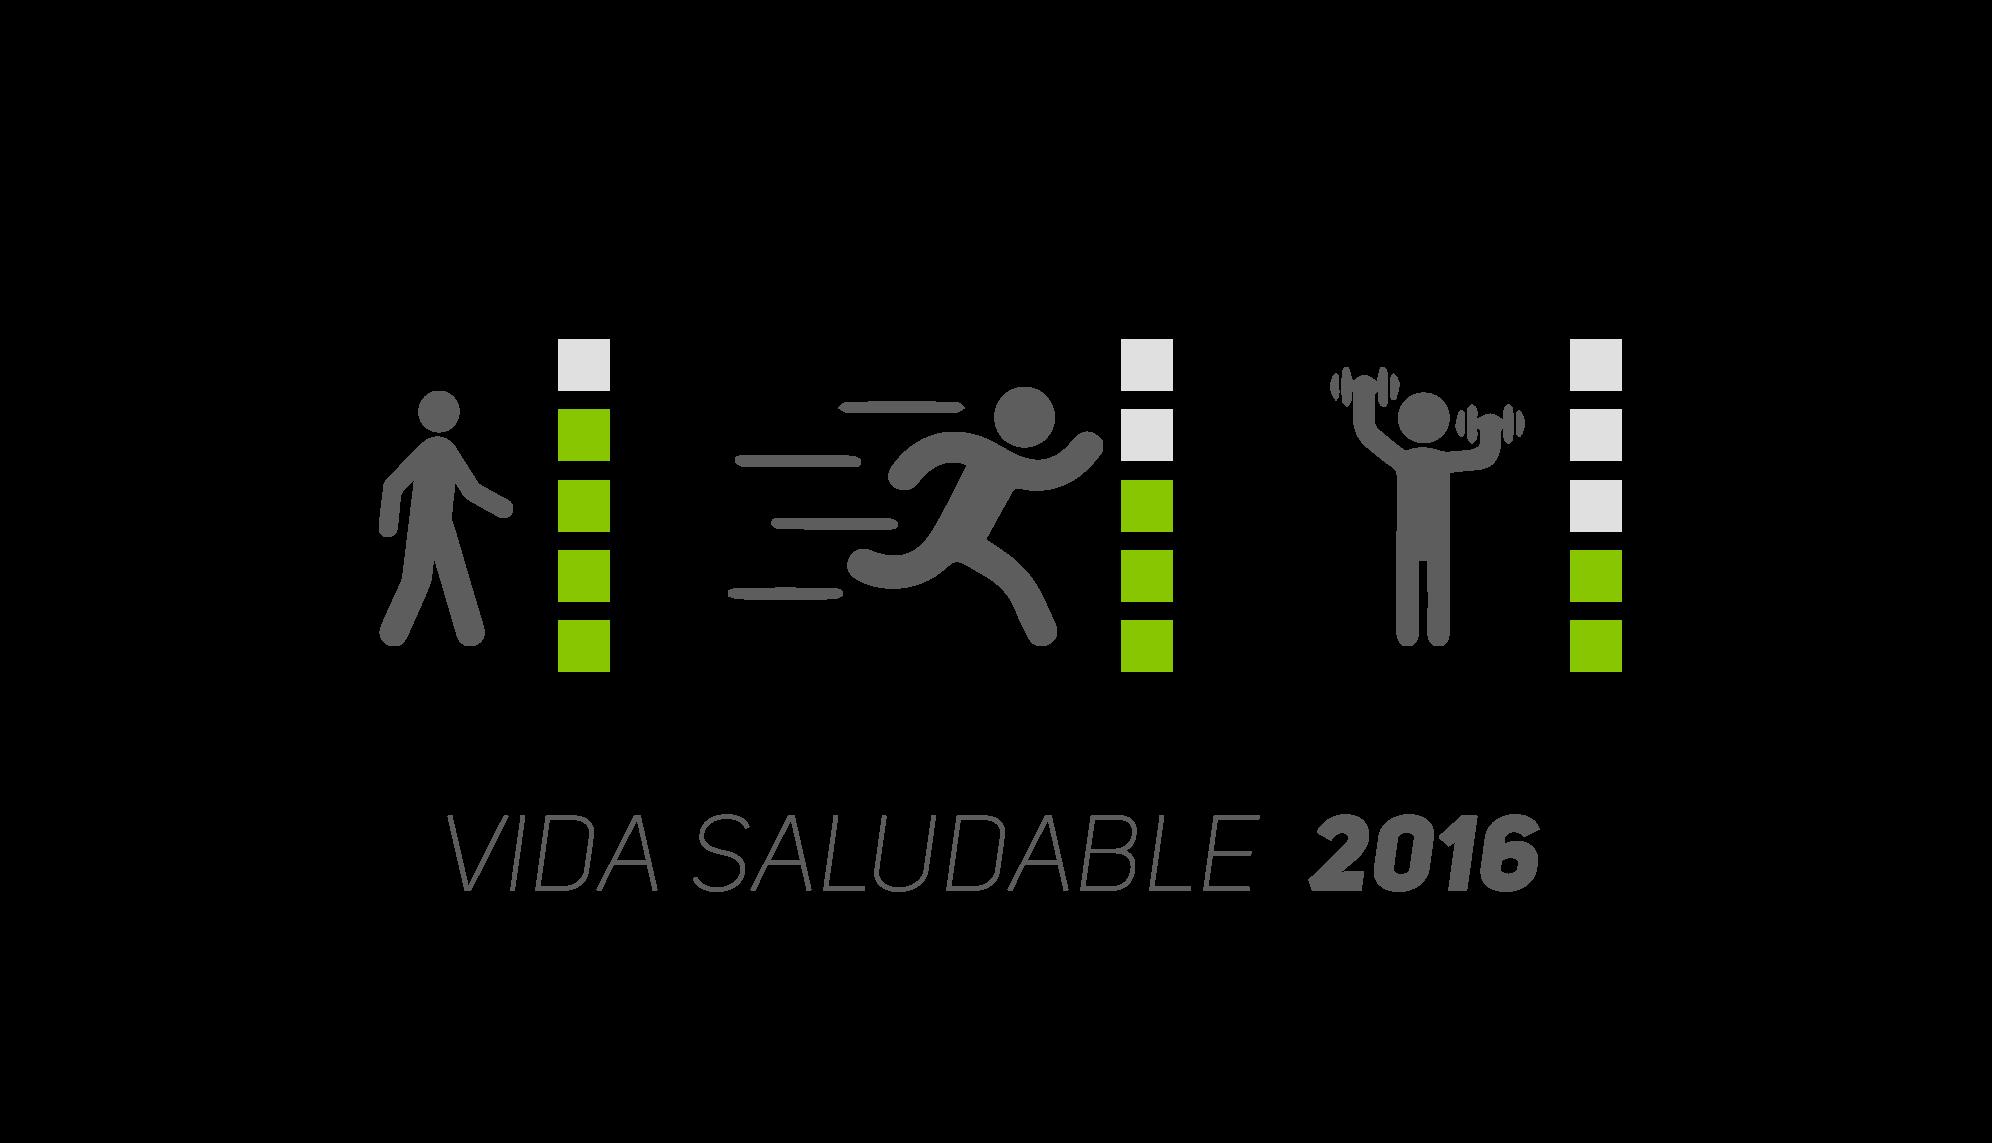 Vida Saludable 2016